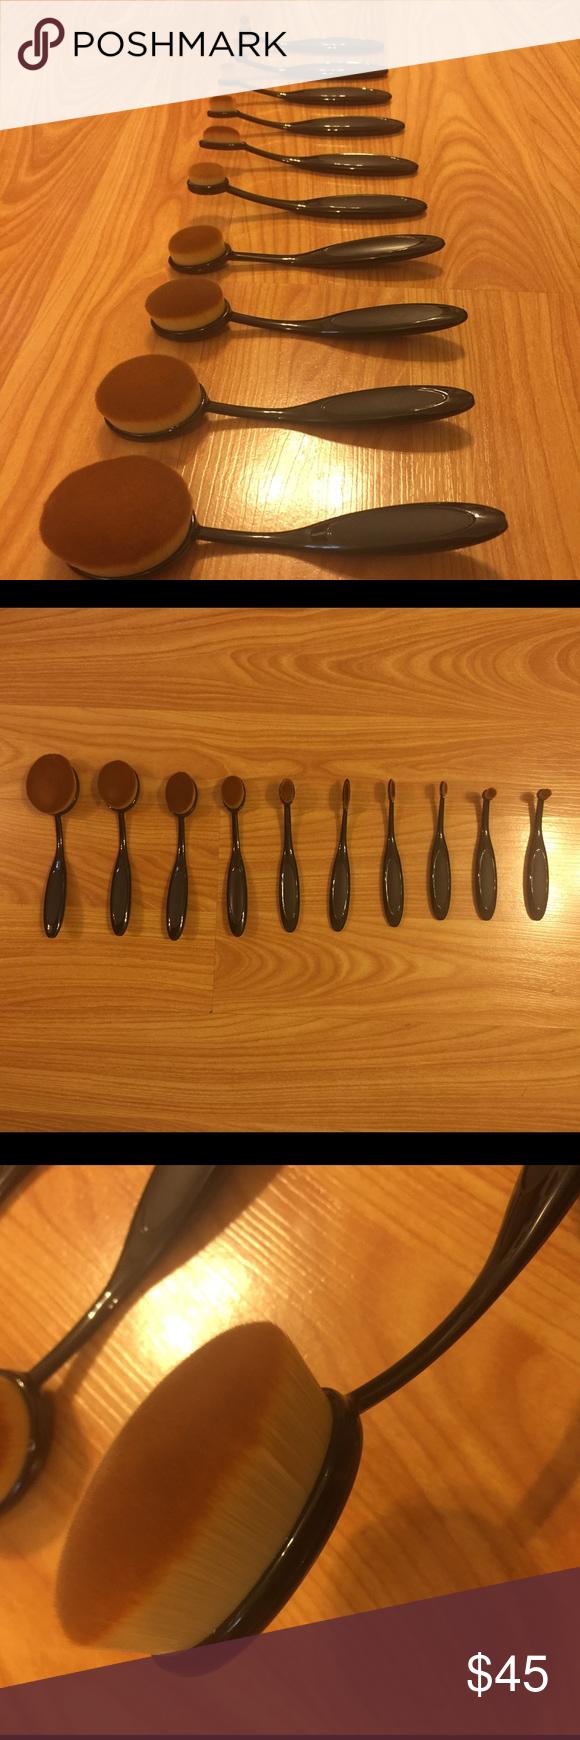 SALE!!! 10 Pc. Oval Makeup Brush Set SET OF 10 OVAL MAKEUP